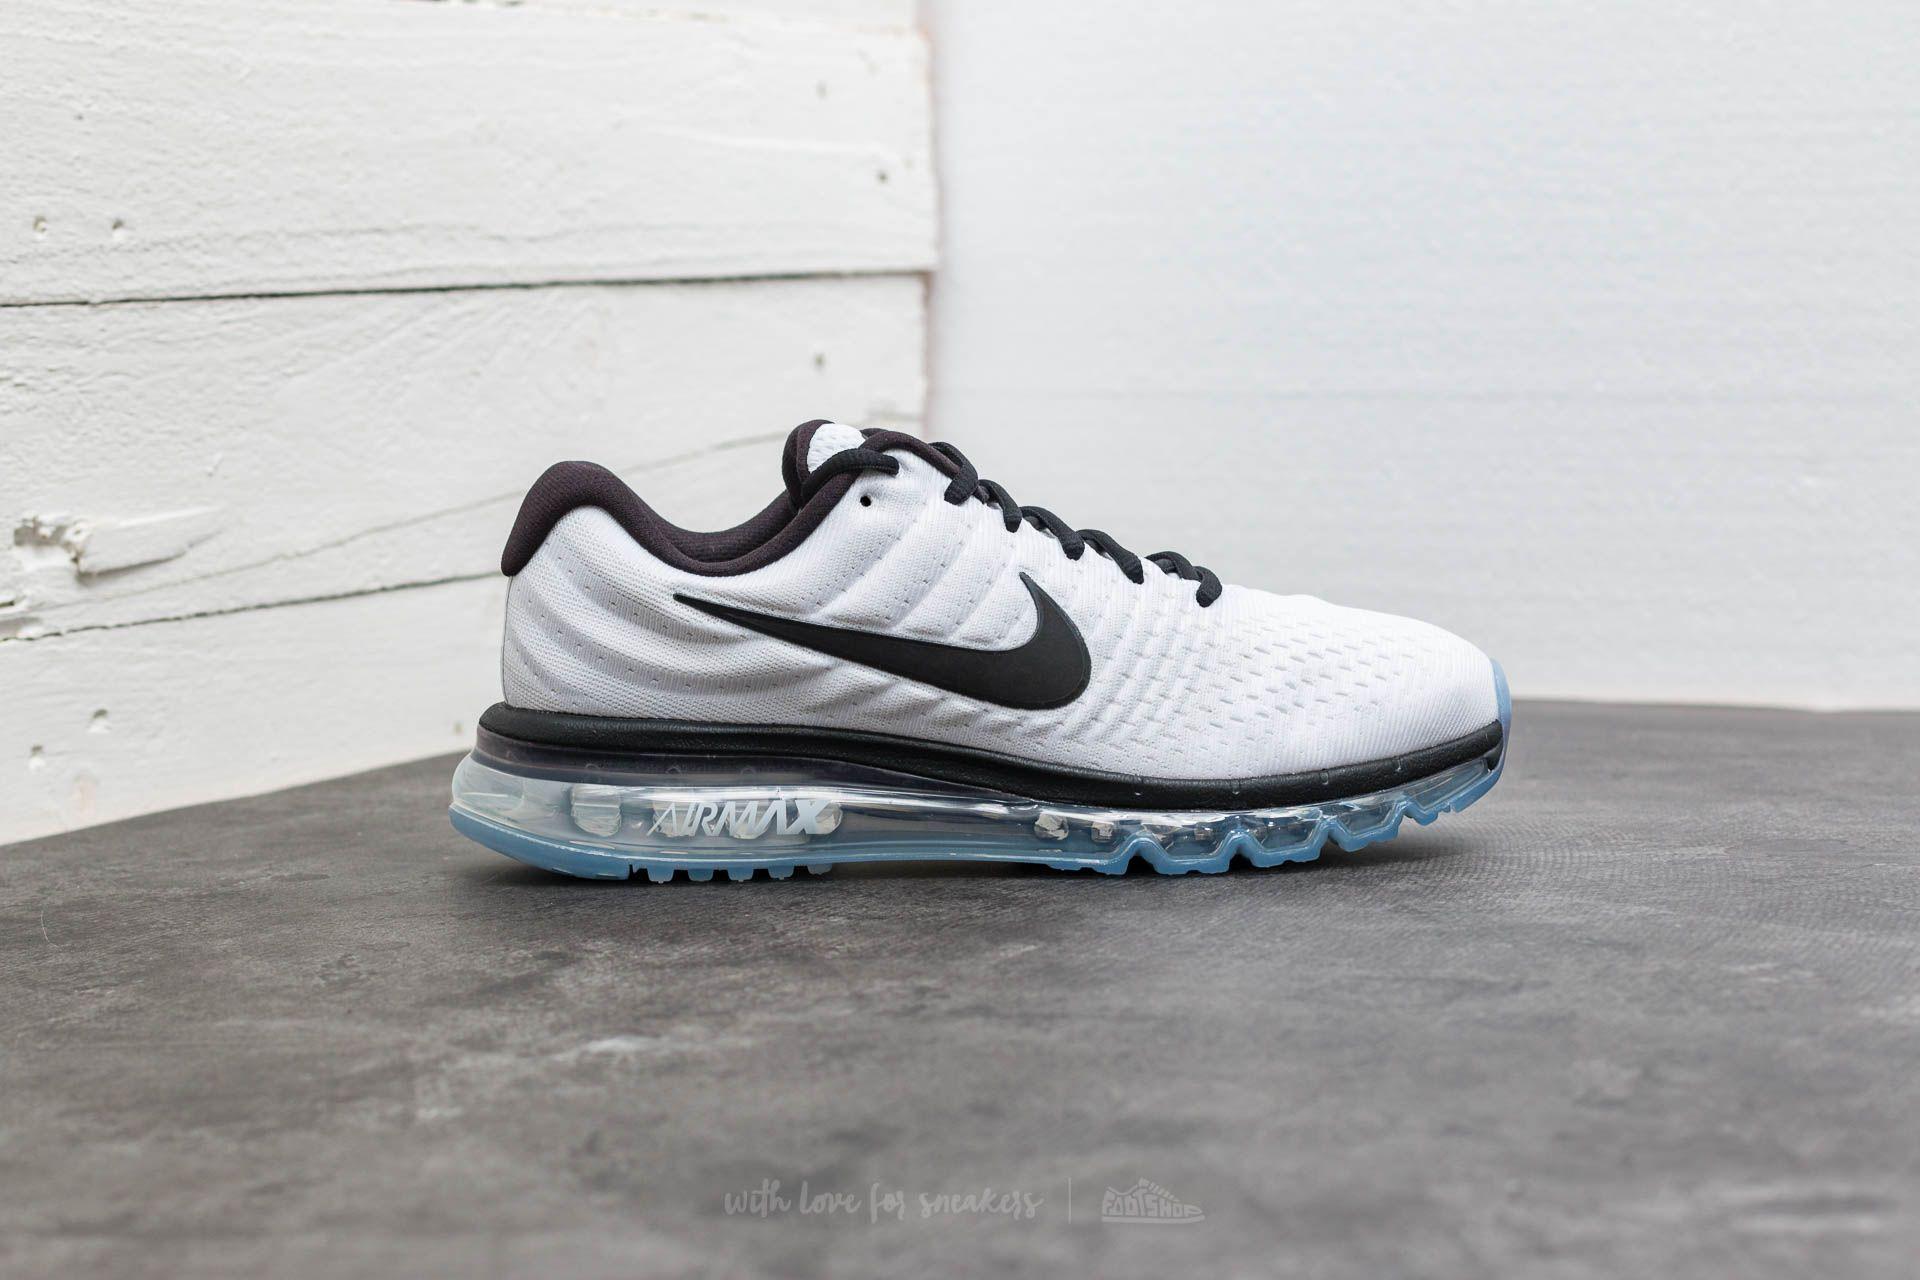 best service f2ff0 ccbe8 Nike Air Max 2017 White/ Black | Footshop